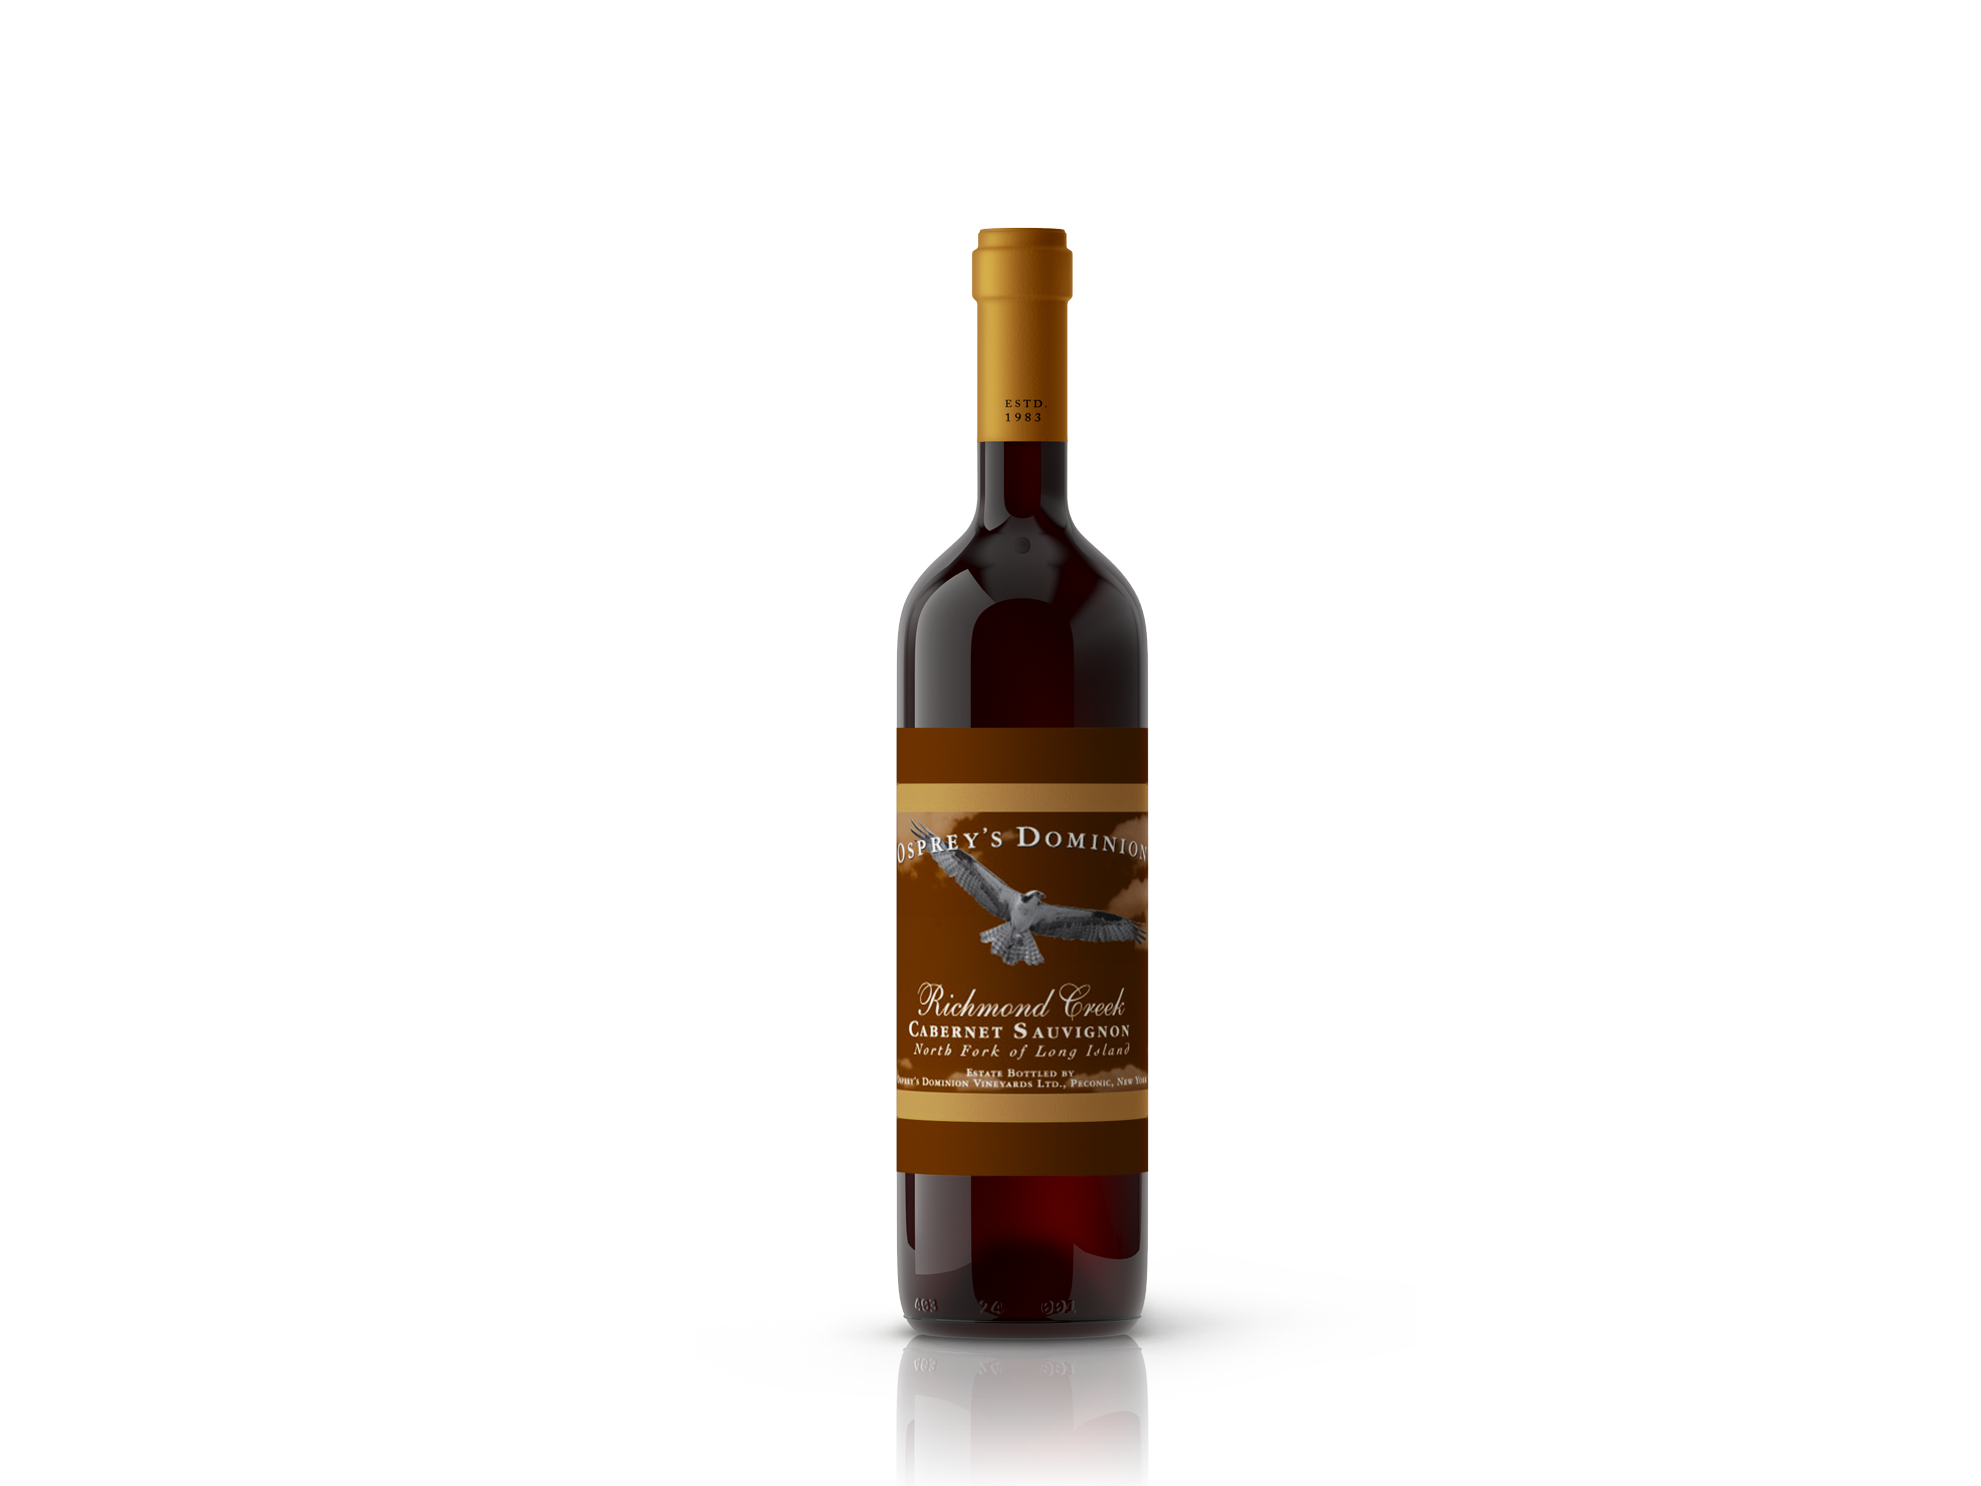 richmond creek cabernet sauvignon wine